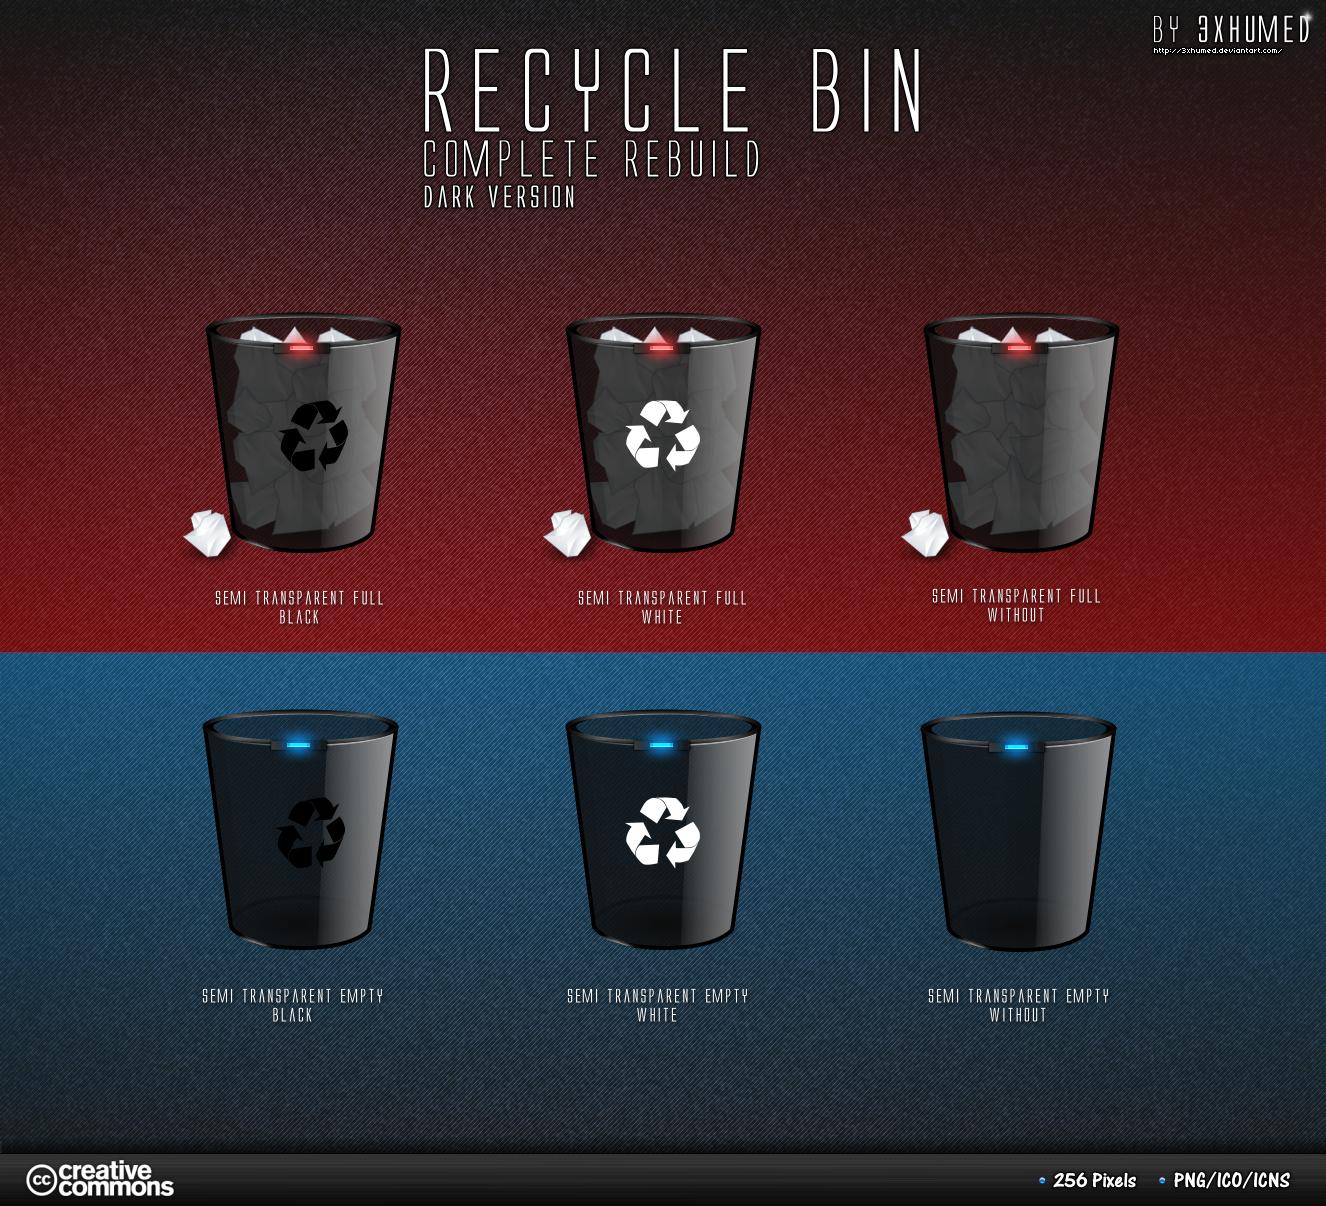 Recycle Bin - Black Version2 by 3xhumed